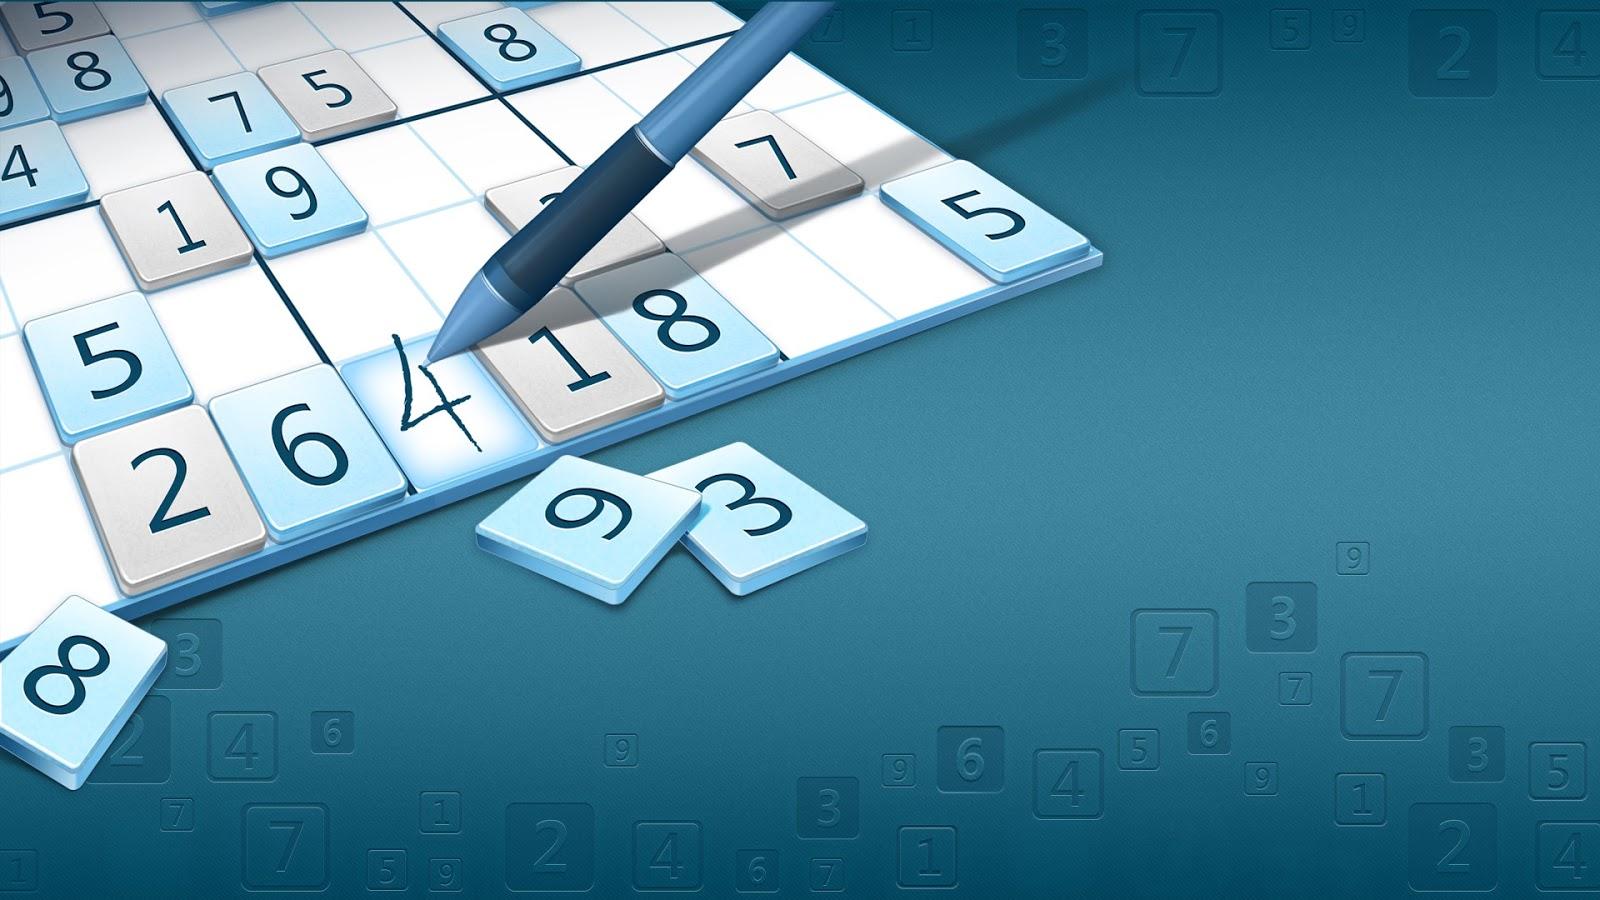 Microsoft Sudoku iPhone Game